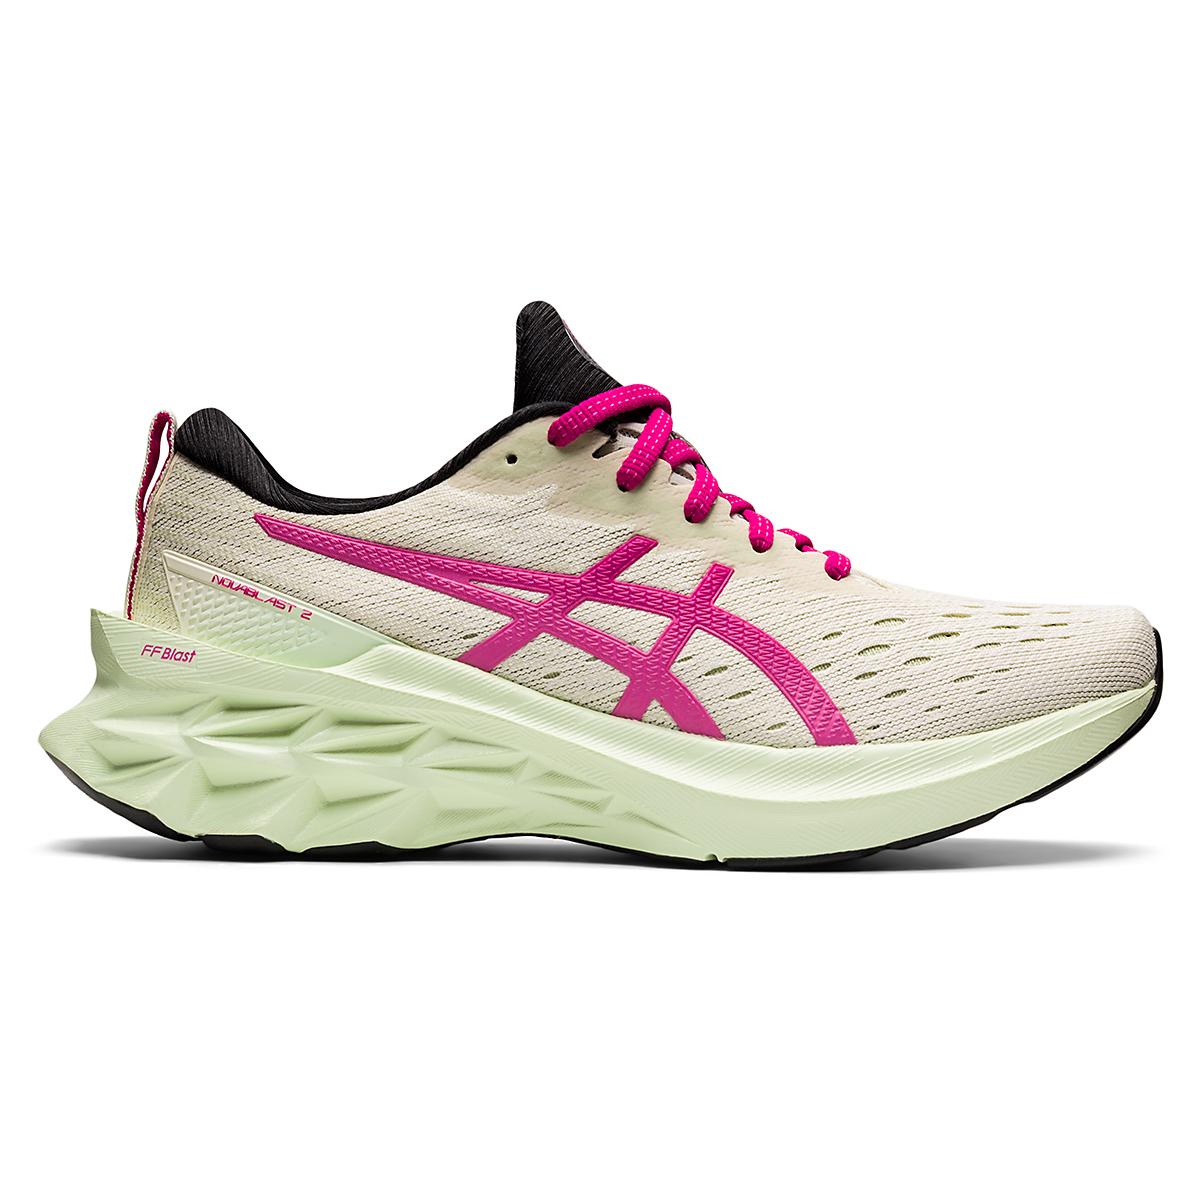 Women's Asics Novablast 2 Running Shoe - Color: Birch/Pink Rave - Size: 5 - Width: Regular, Birch/Pink Rave, large, image 1